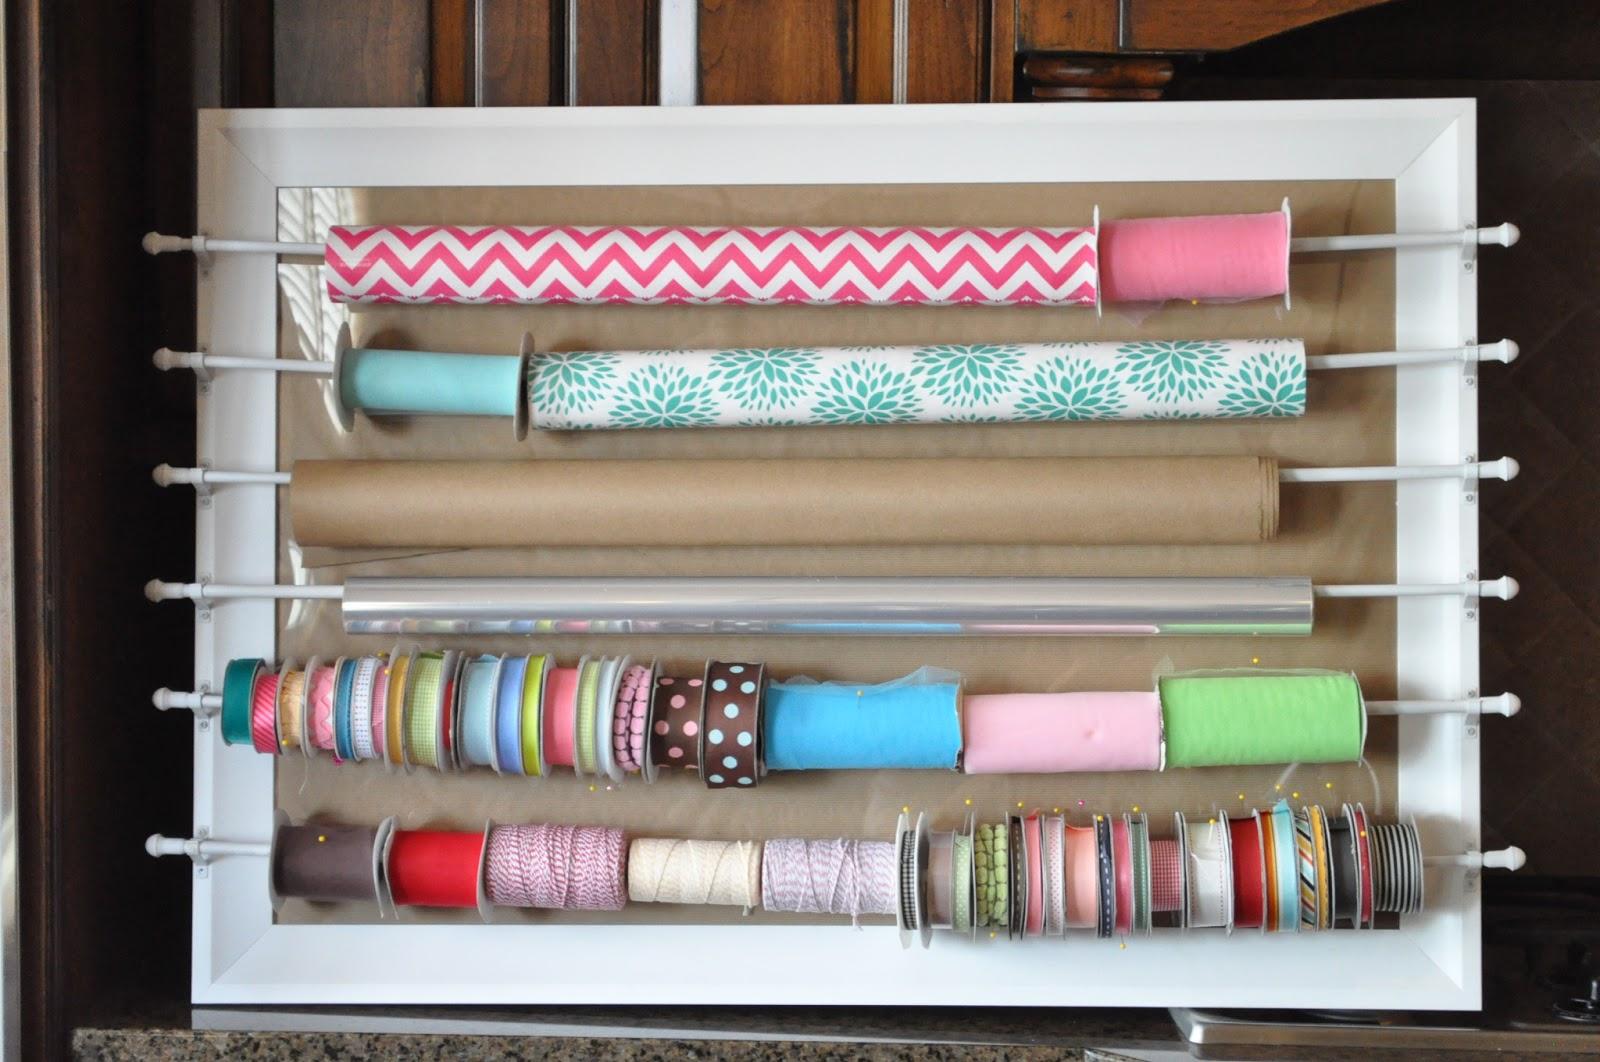 wrapping paper ribbon organizer video tutorial for joann fabrics